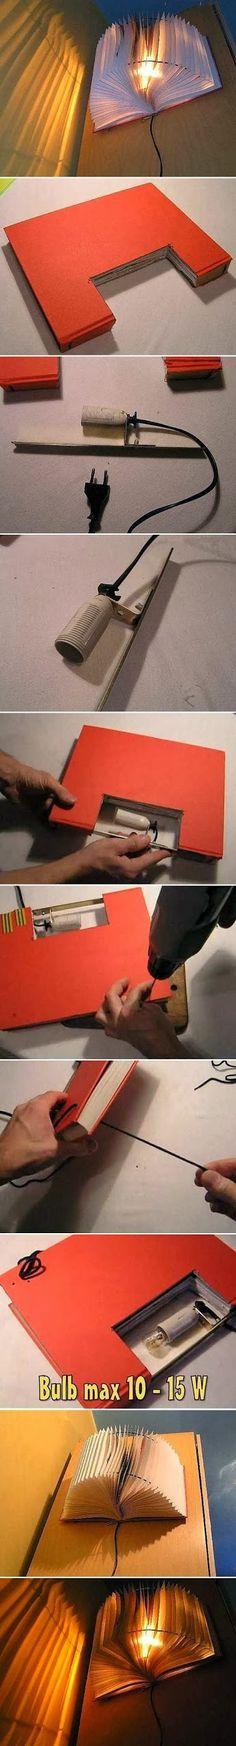 DIY Small Book Light